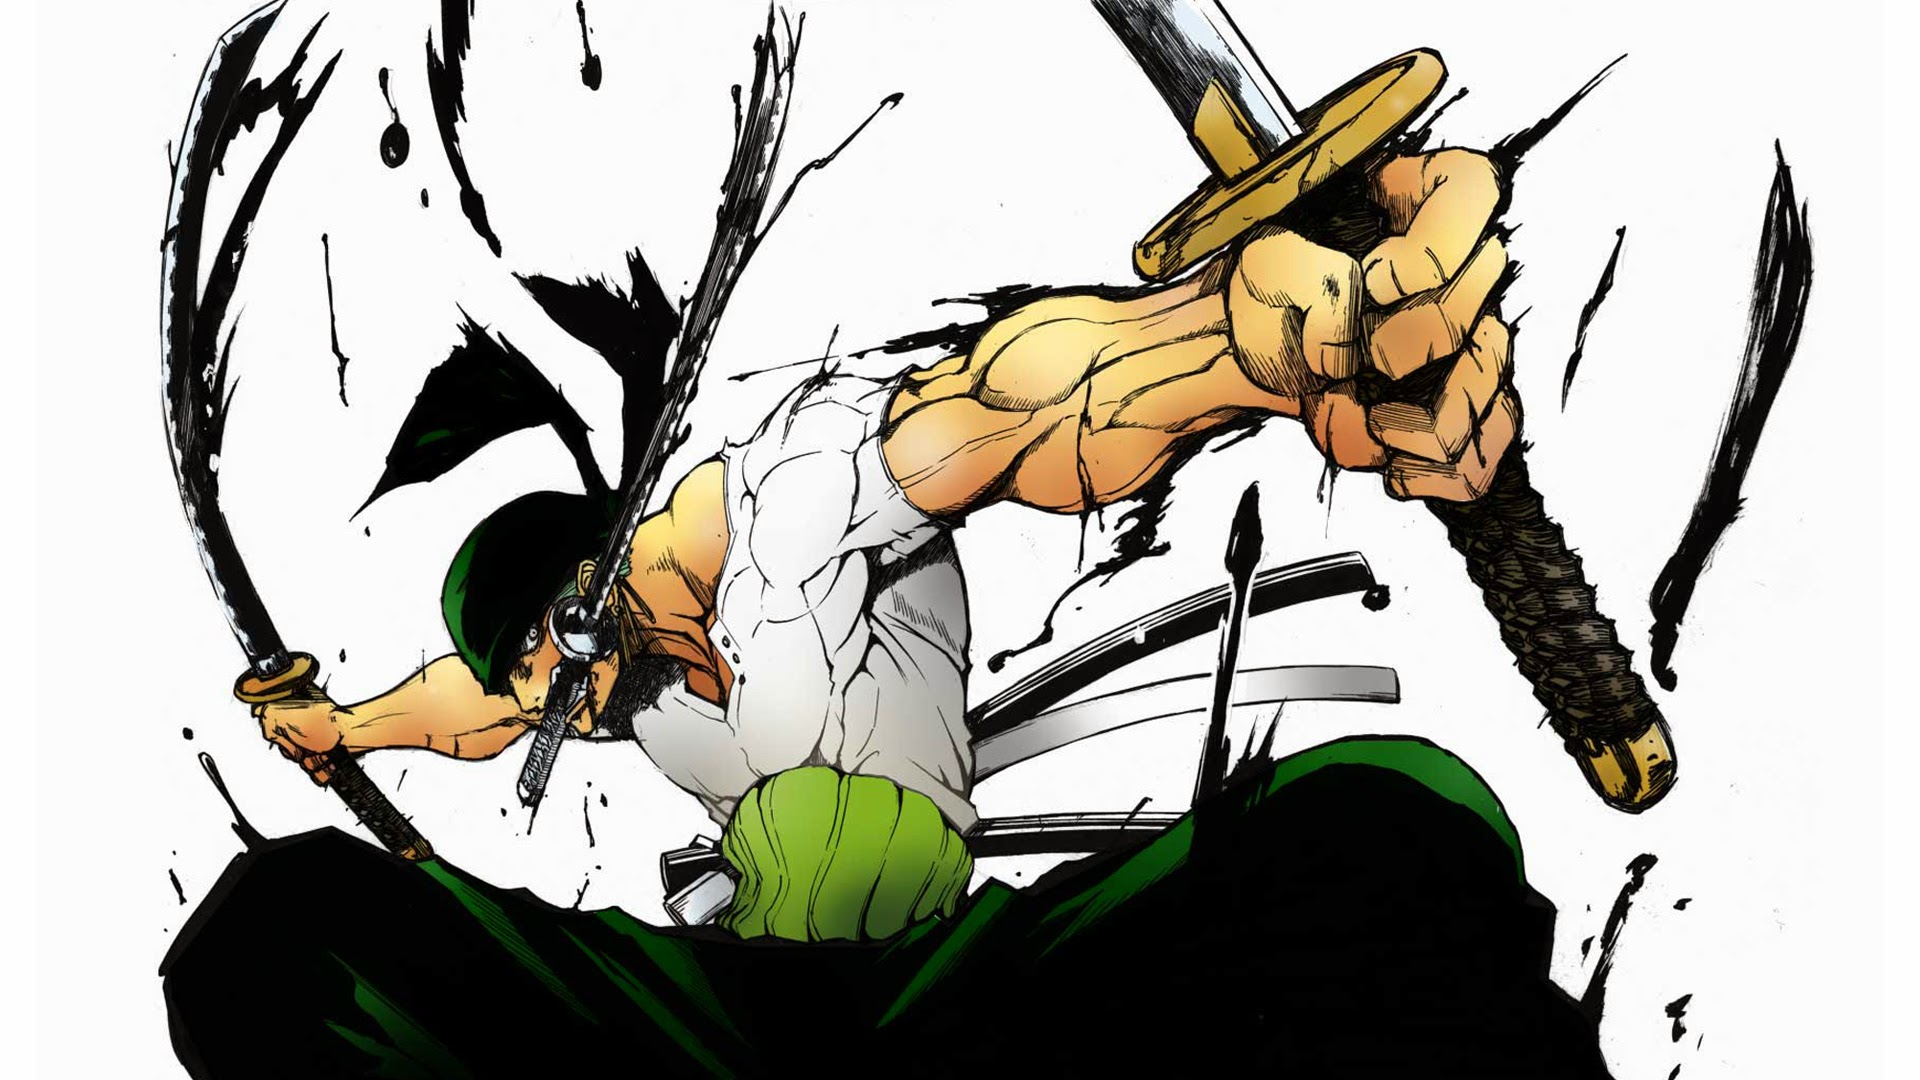 Roronoa Zoro 3 Sword Style 2u Wallpaper HD 1920x1080